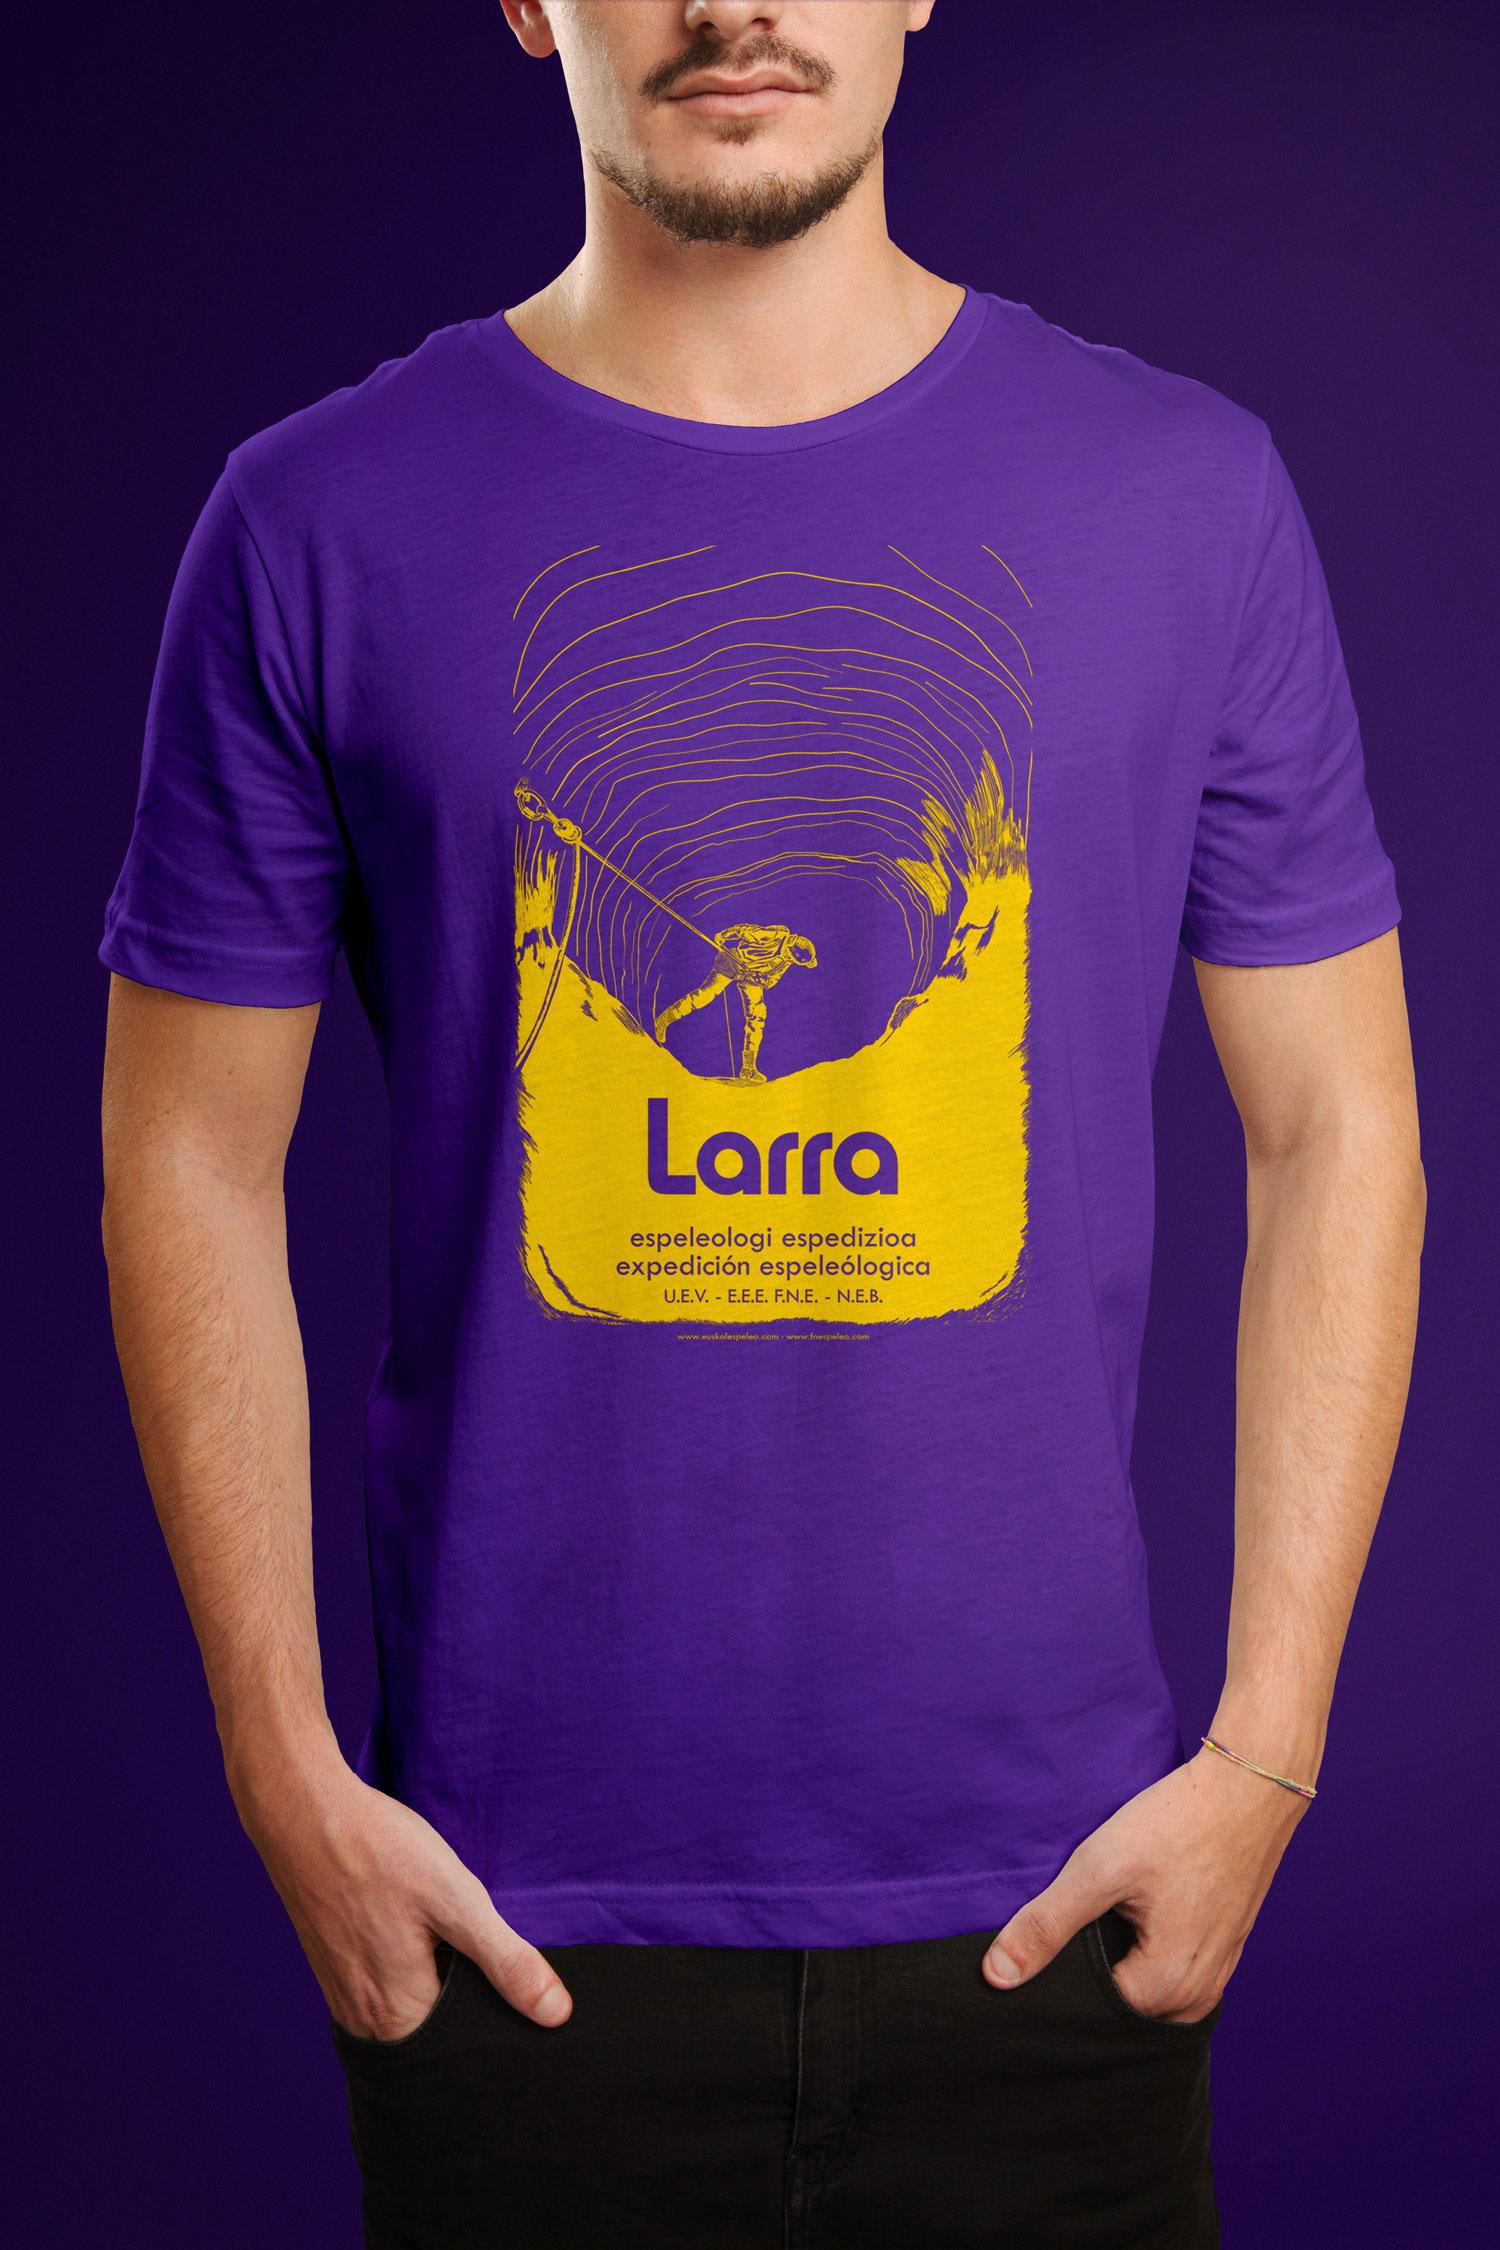 speleo t-shirts illustration